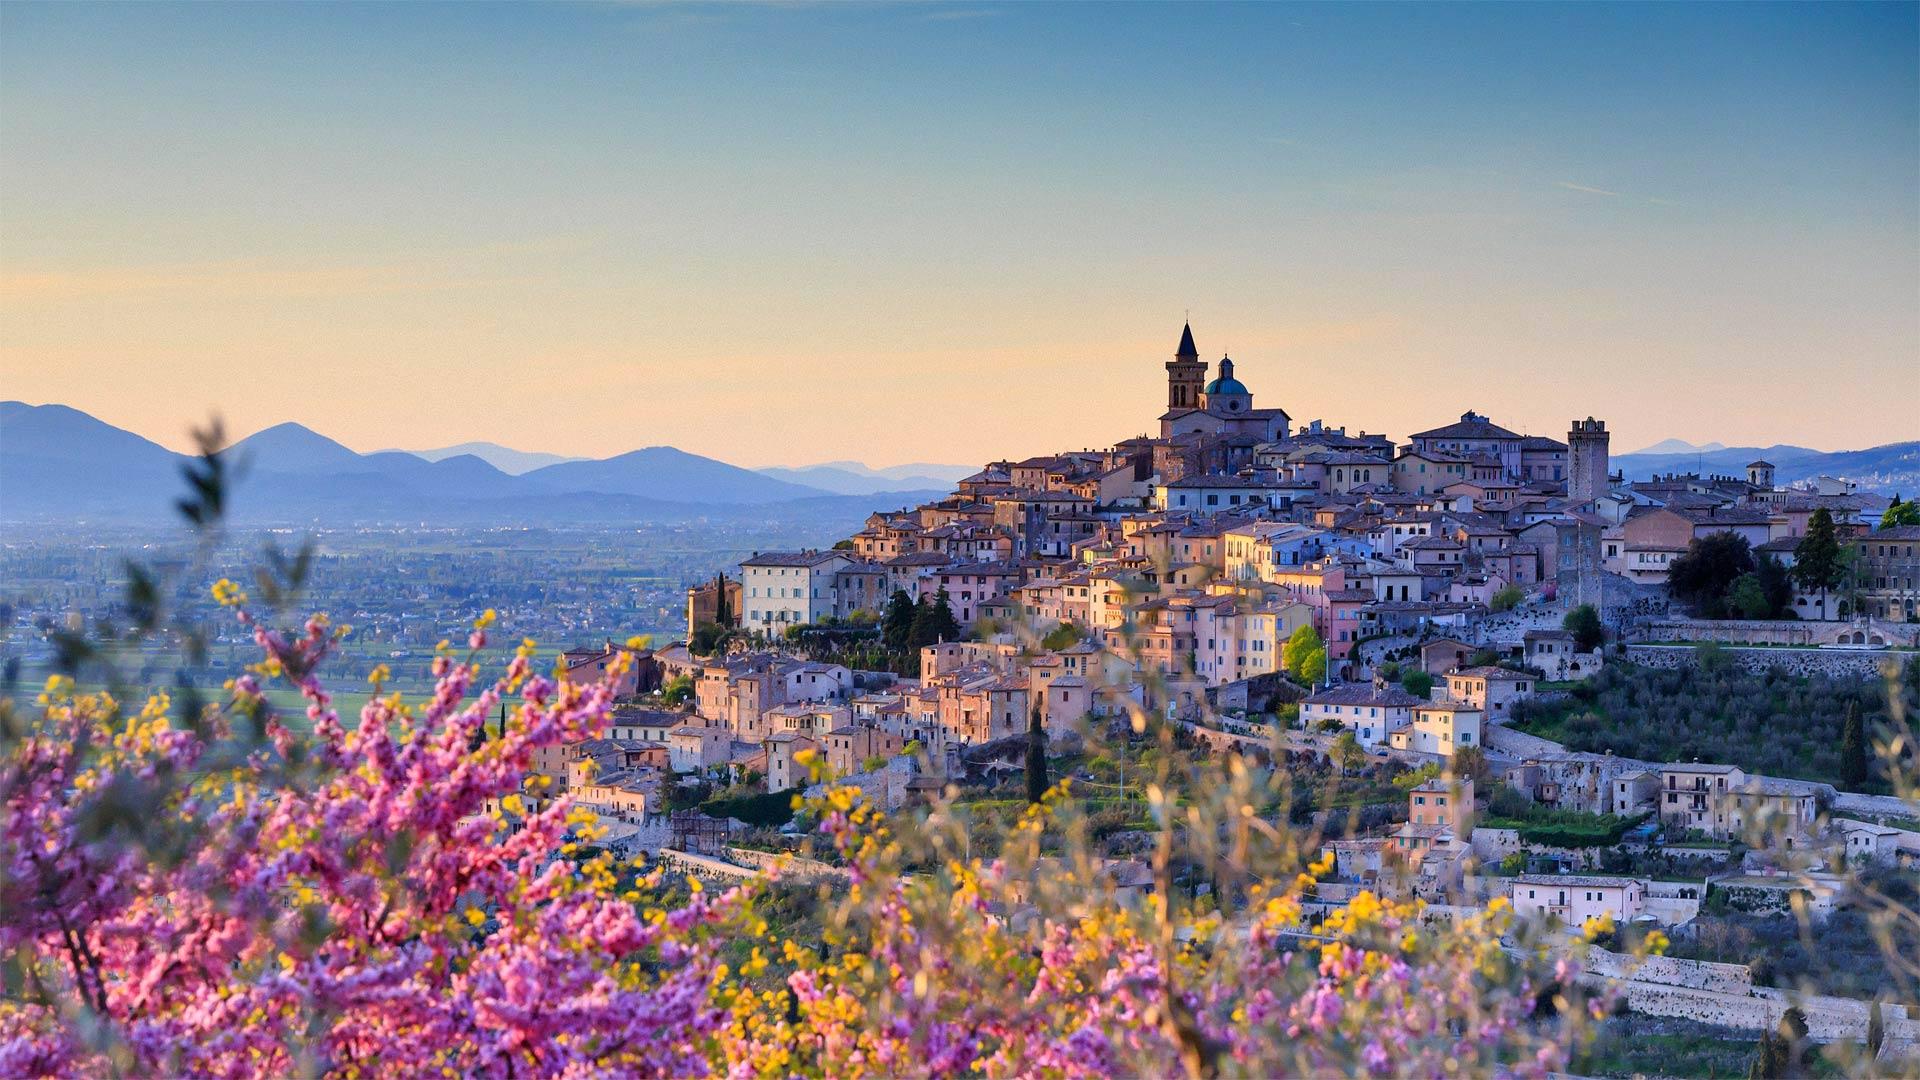 Almond blossoms overlooking Trevi, Umbria, Italy (© Maurizio Rellini/eStock Photo)(Bing United States)